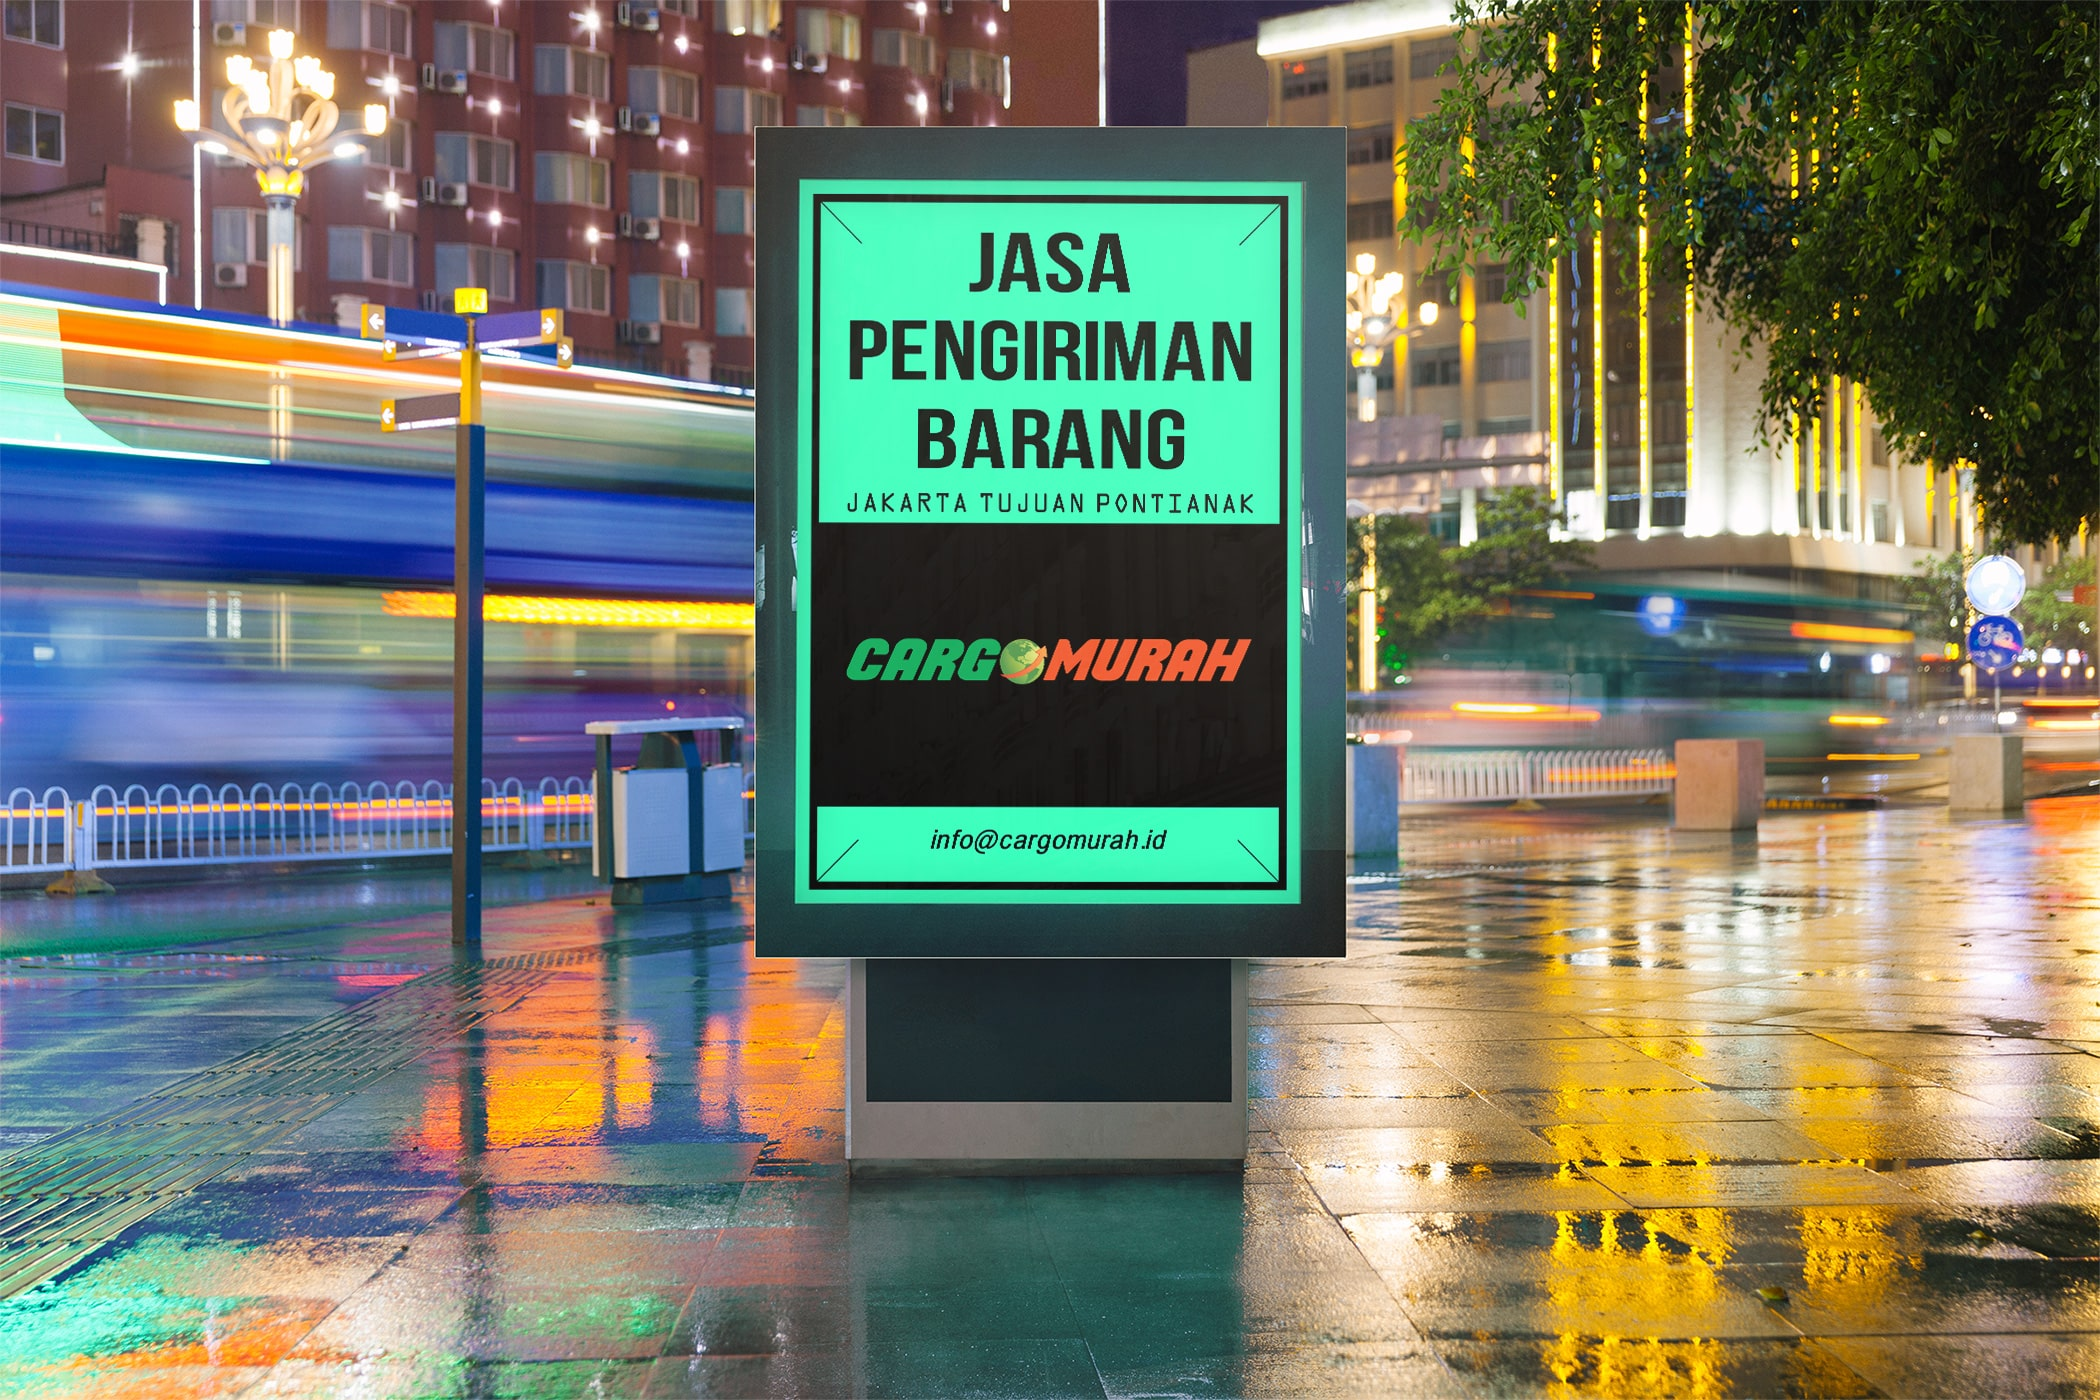 Jasa Kargo Jakarta ke Pontianak Kalimantan Barat